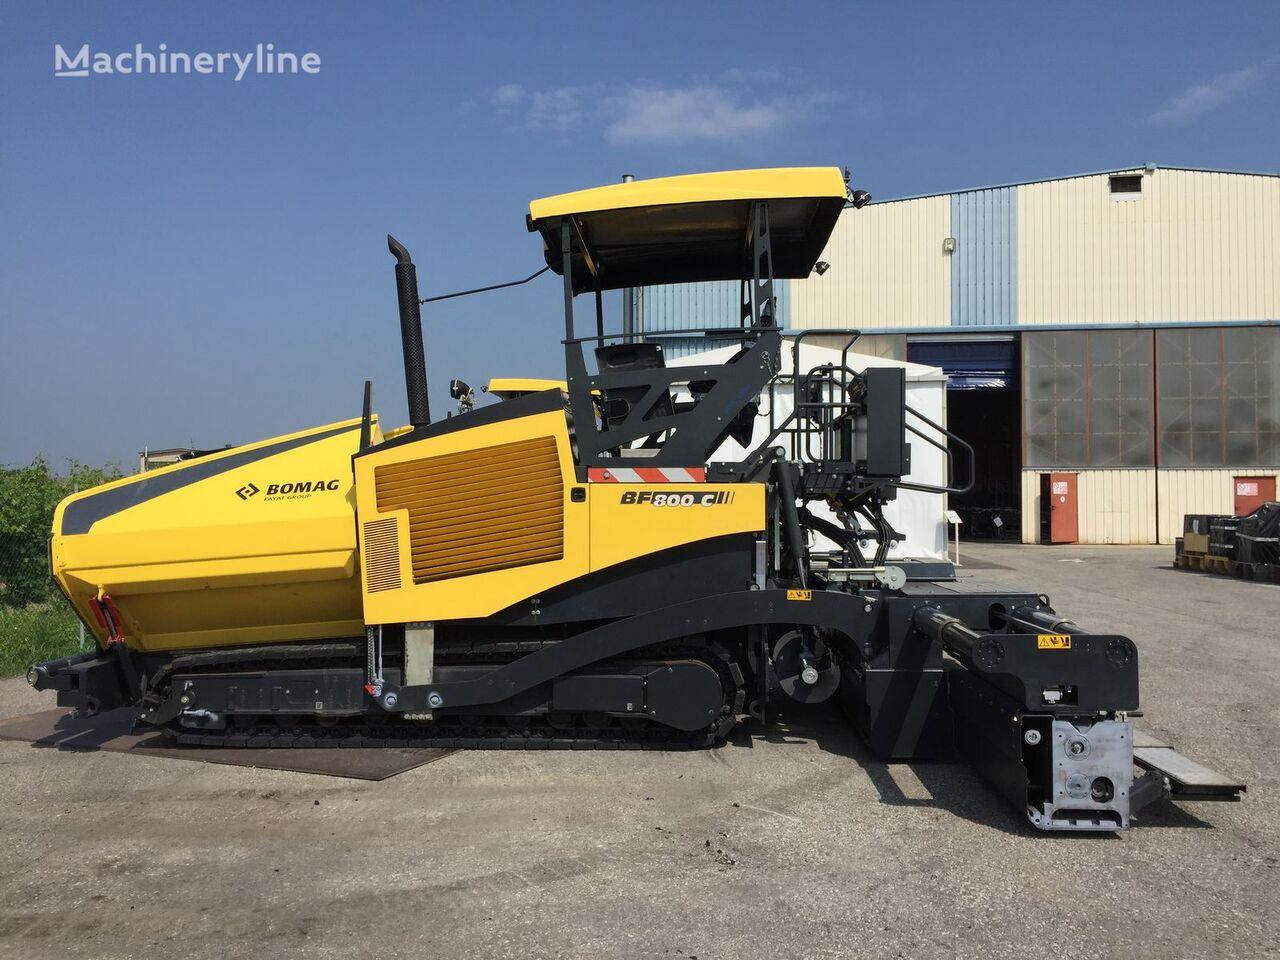 BOMAG BF 800 C S600  crawler asphalt paver